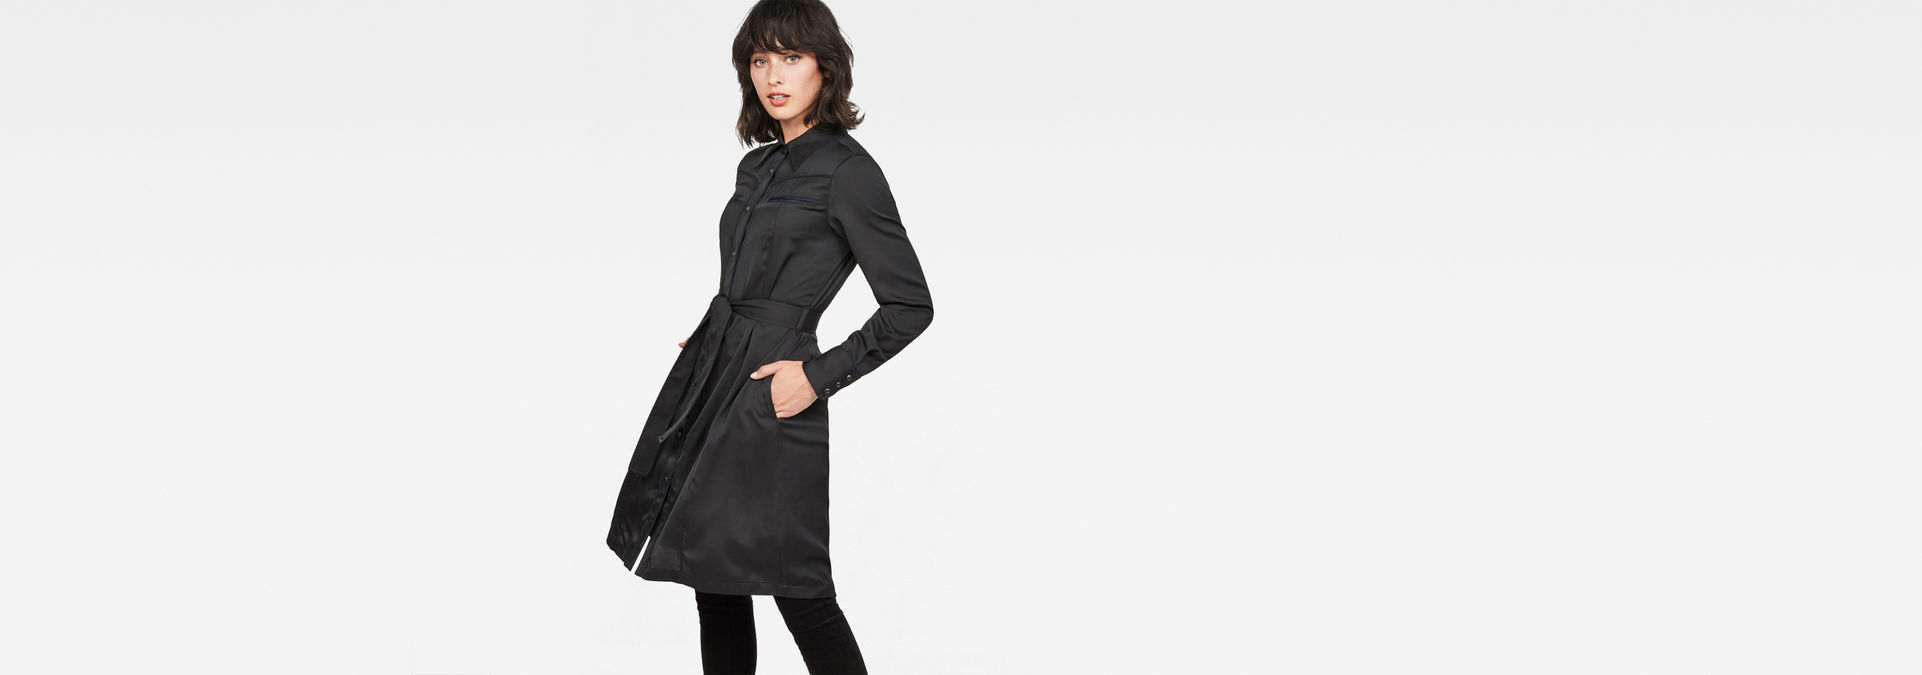 Shirt Raw® Tacoma Flare DressDark G Star Straight Black W2bE9IYHDe